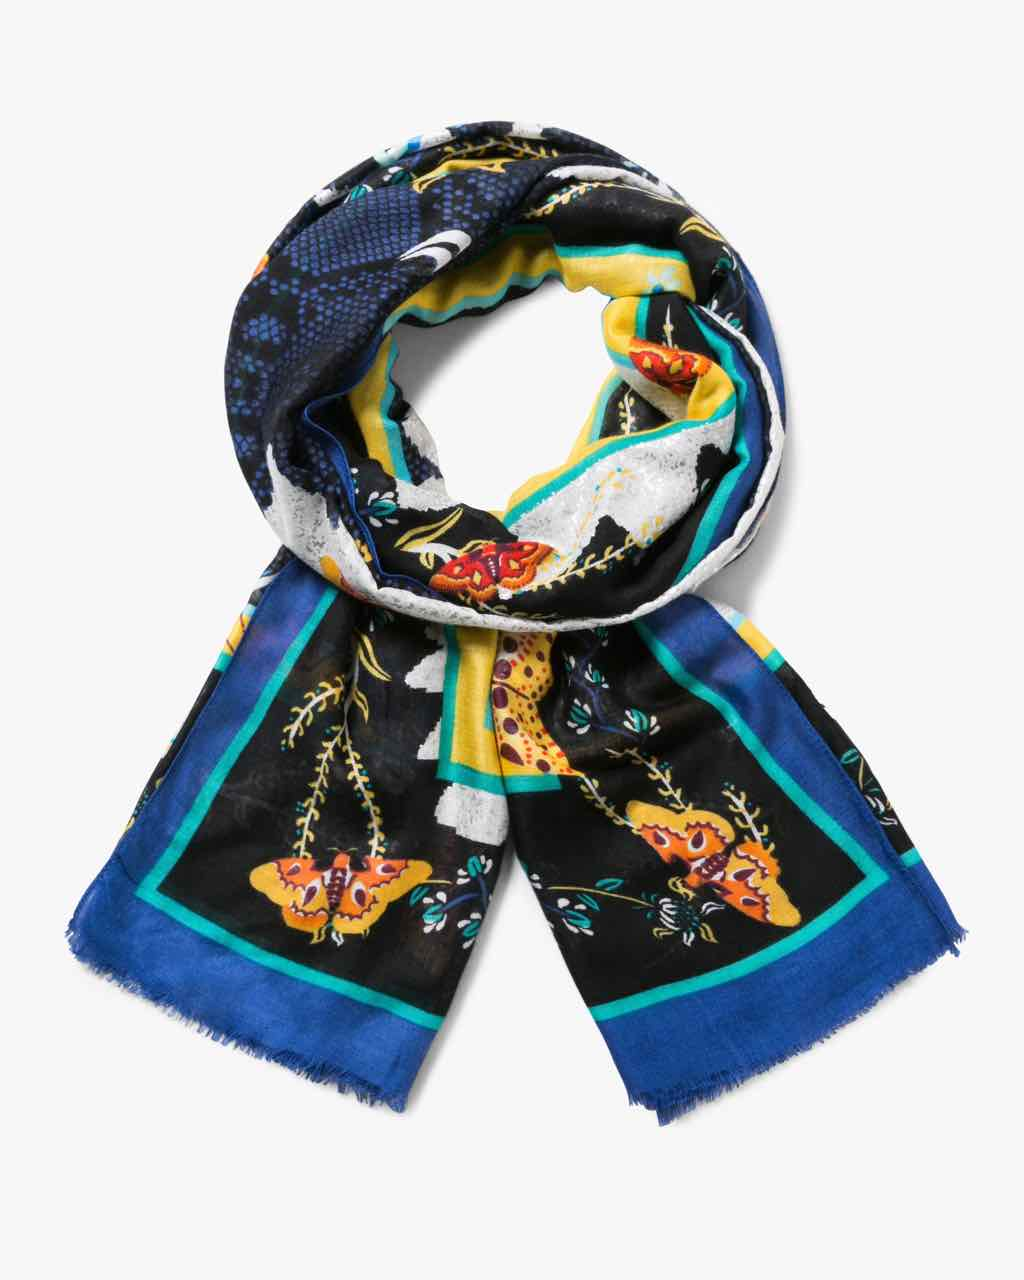 17WAWFH7_5001 Desigual Scarf Winter Floral Big (black blue) Buy Online